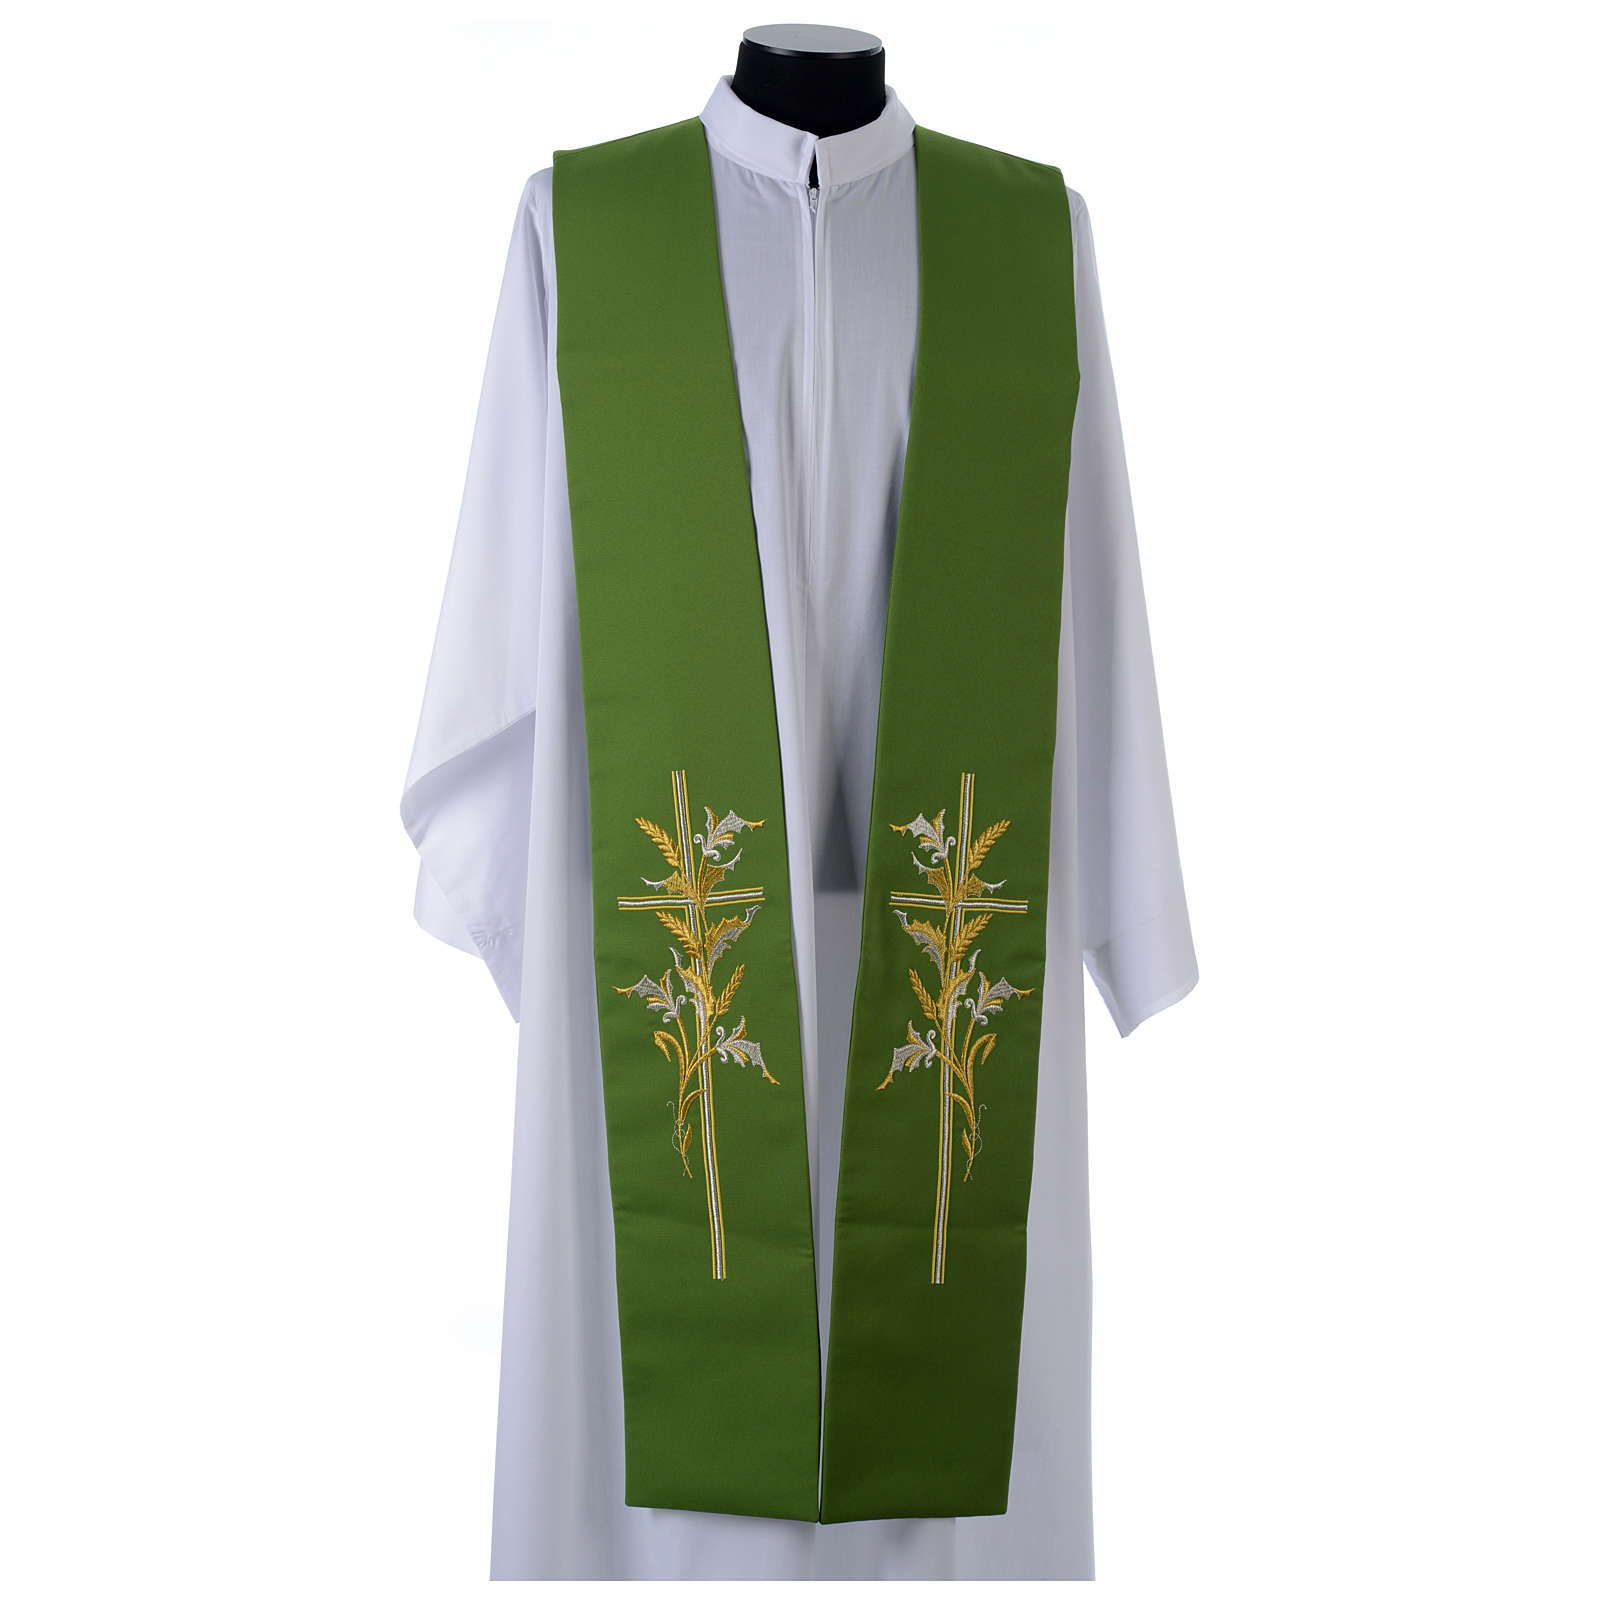 Tristola 100% poliestere croce spighe 4